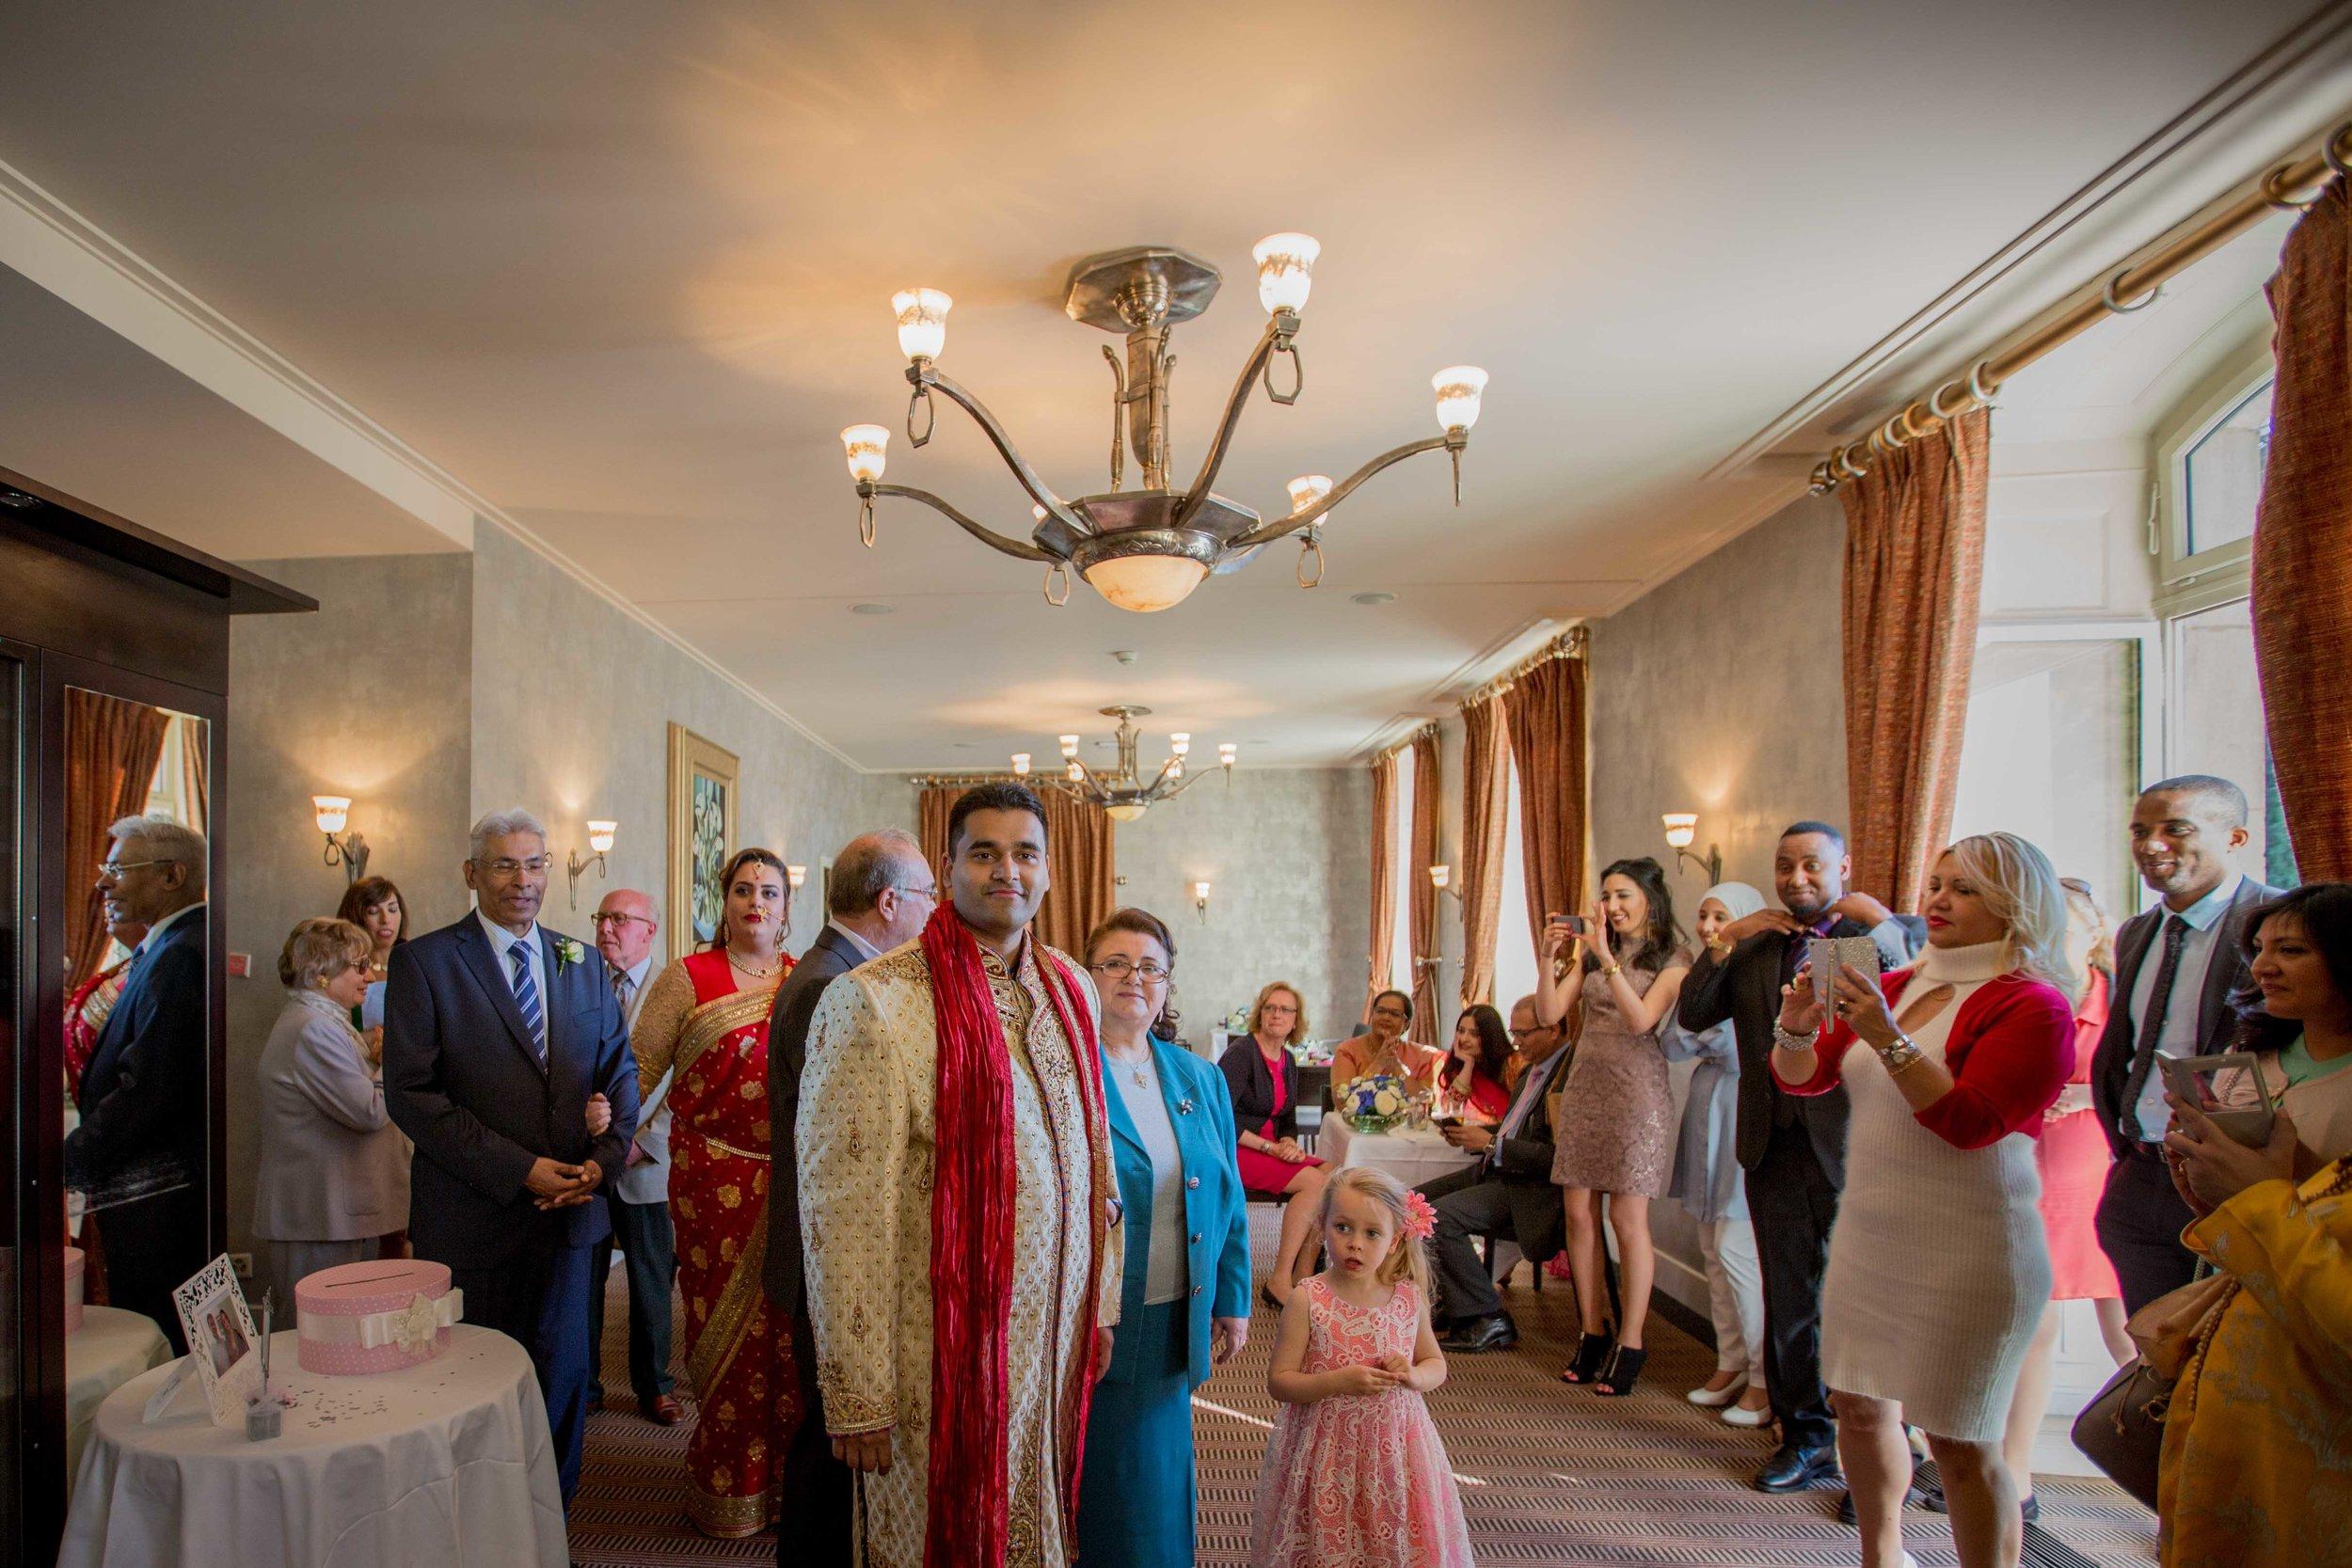 parc-des-eaux-vives-destination-wedding-photographer-geneva-switzerland-natalia-smith-photography-76.jpg